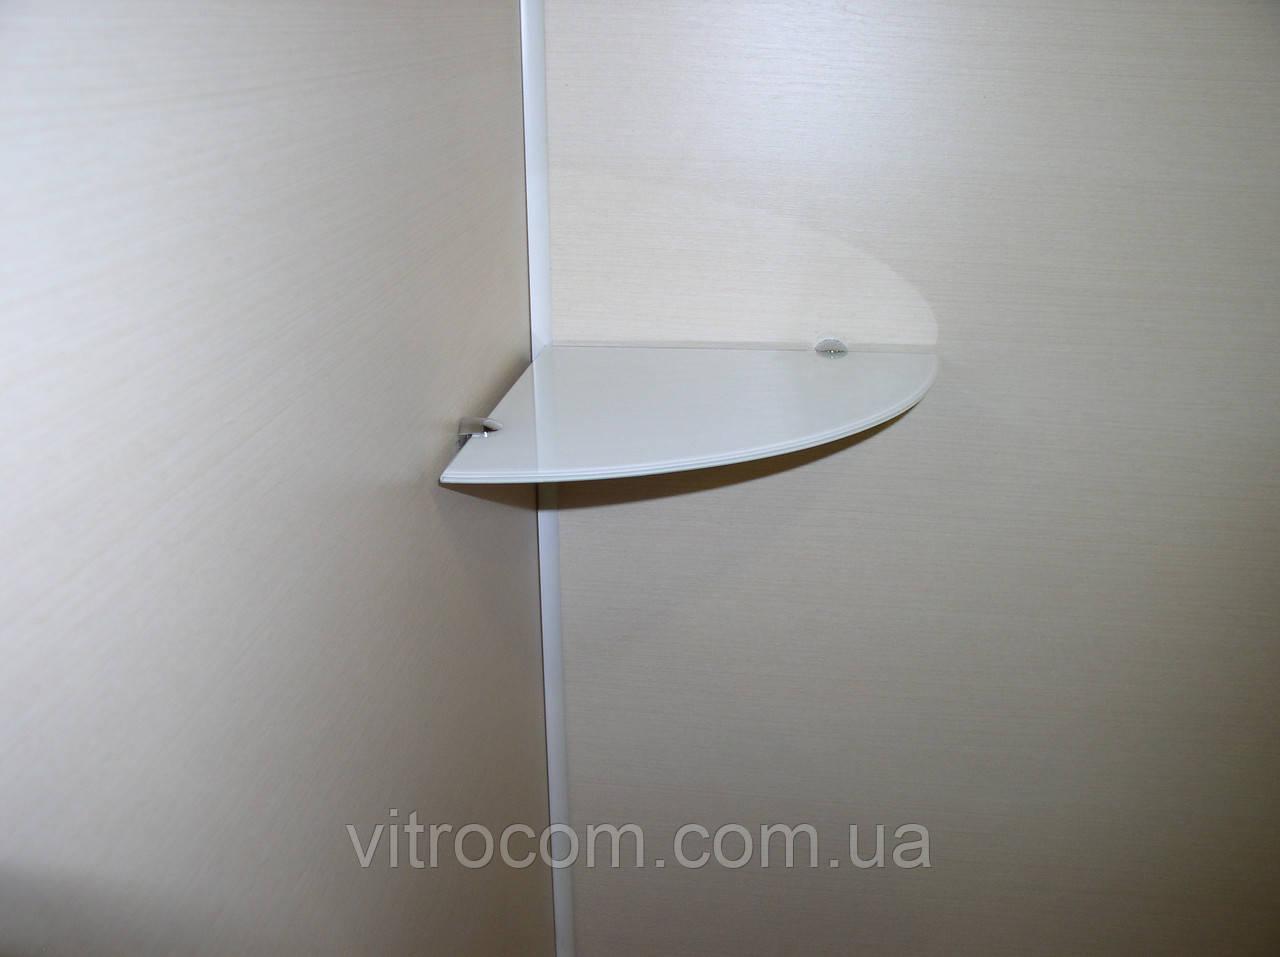 Полка стеклянная угловая 5 мм белая 20 х 20 см